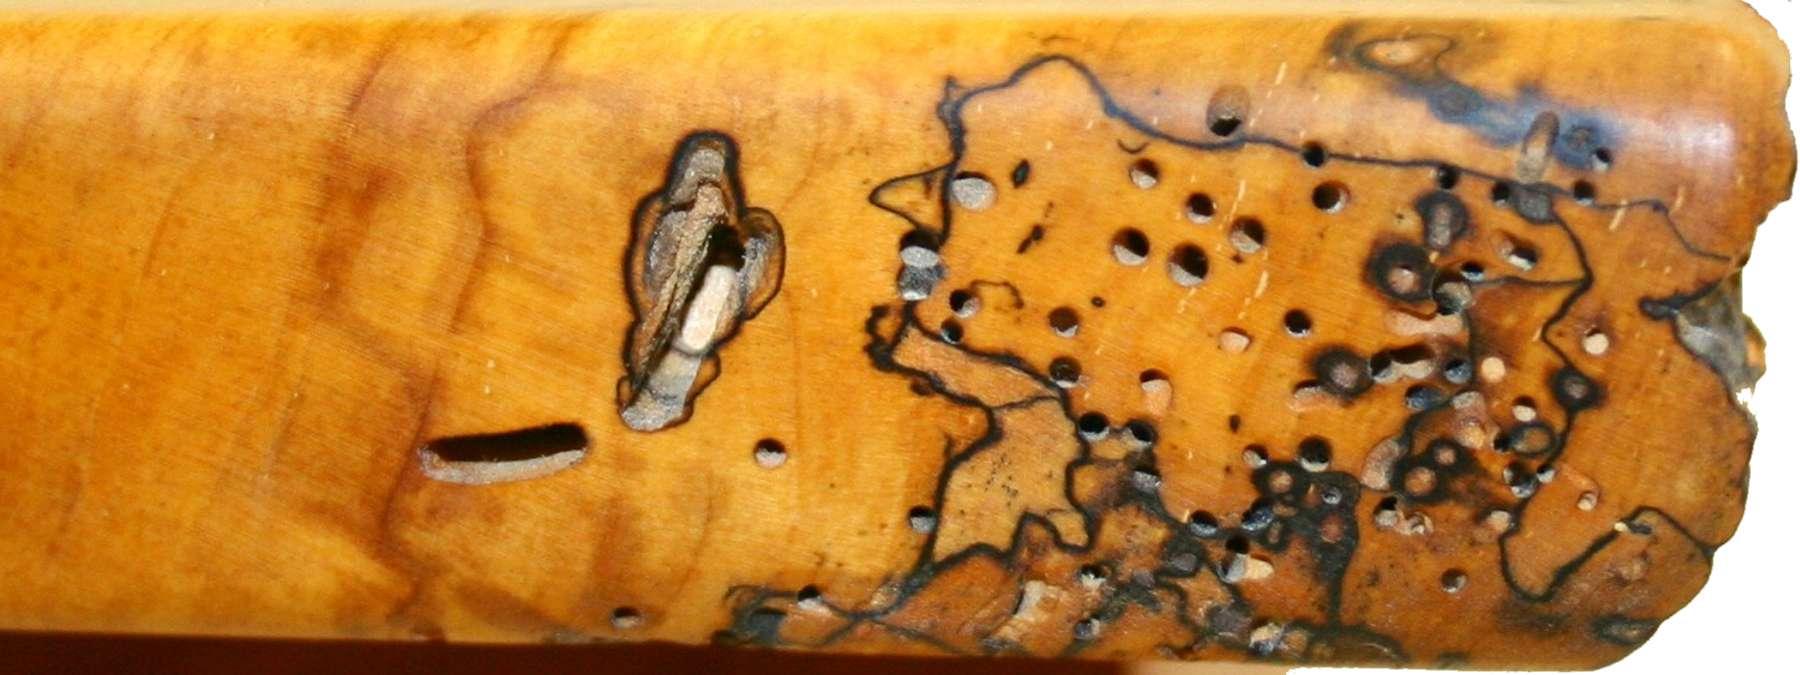 Authentic worm holes